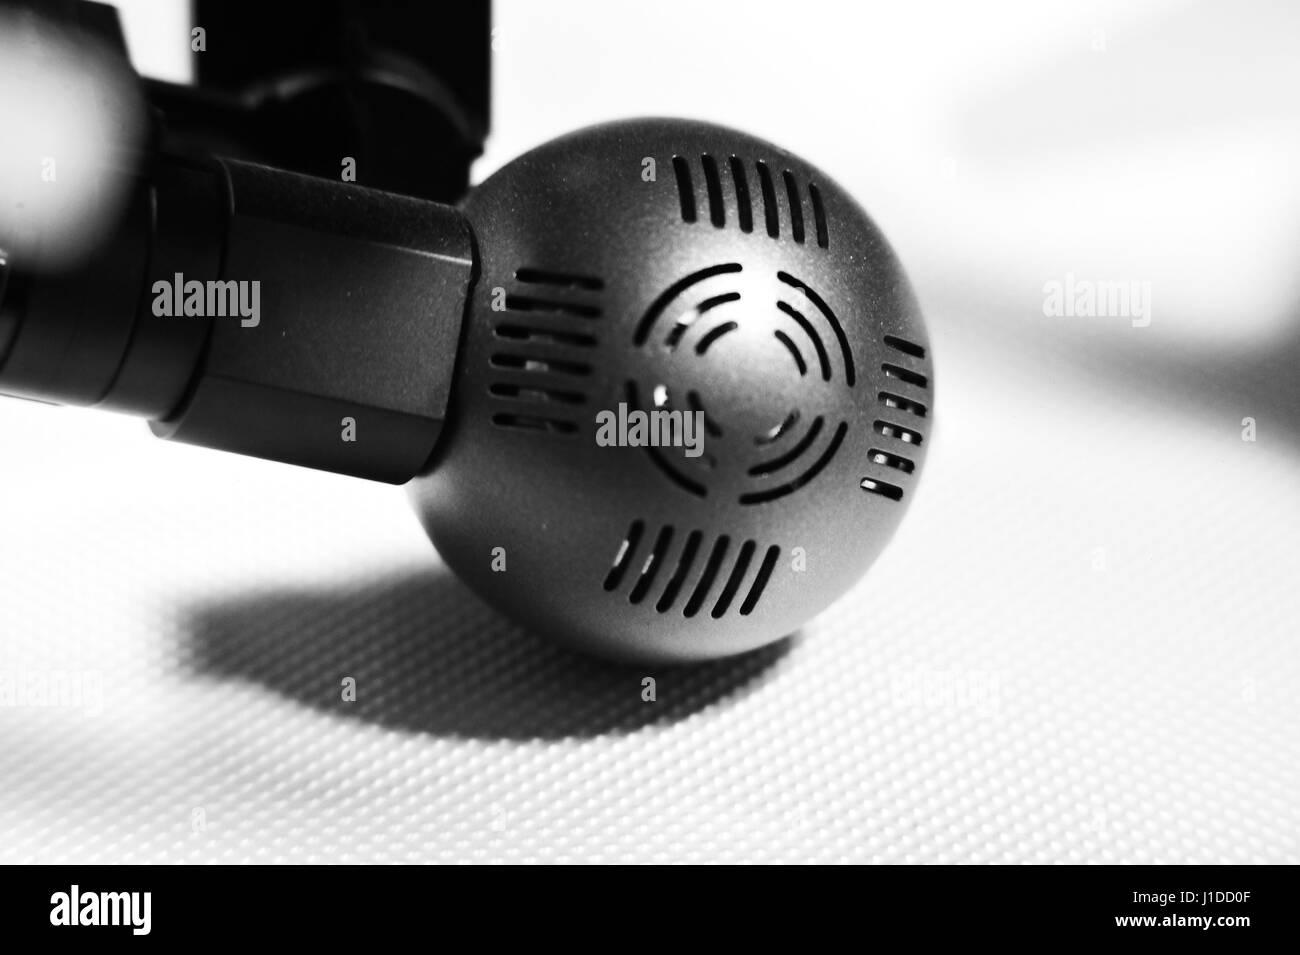 Drone Cam - Stock-Bilder